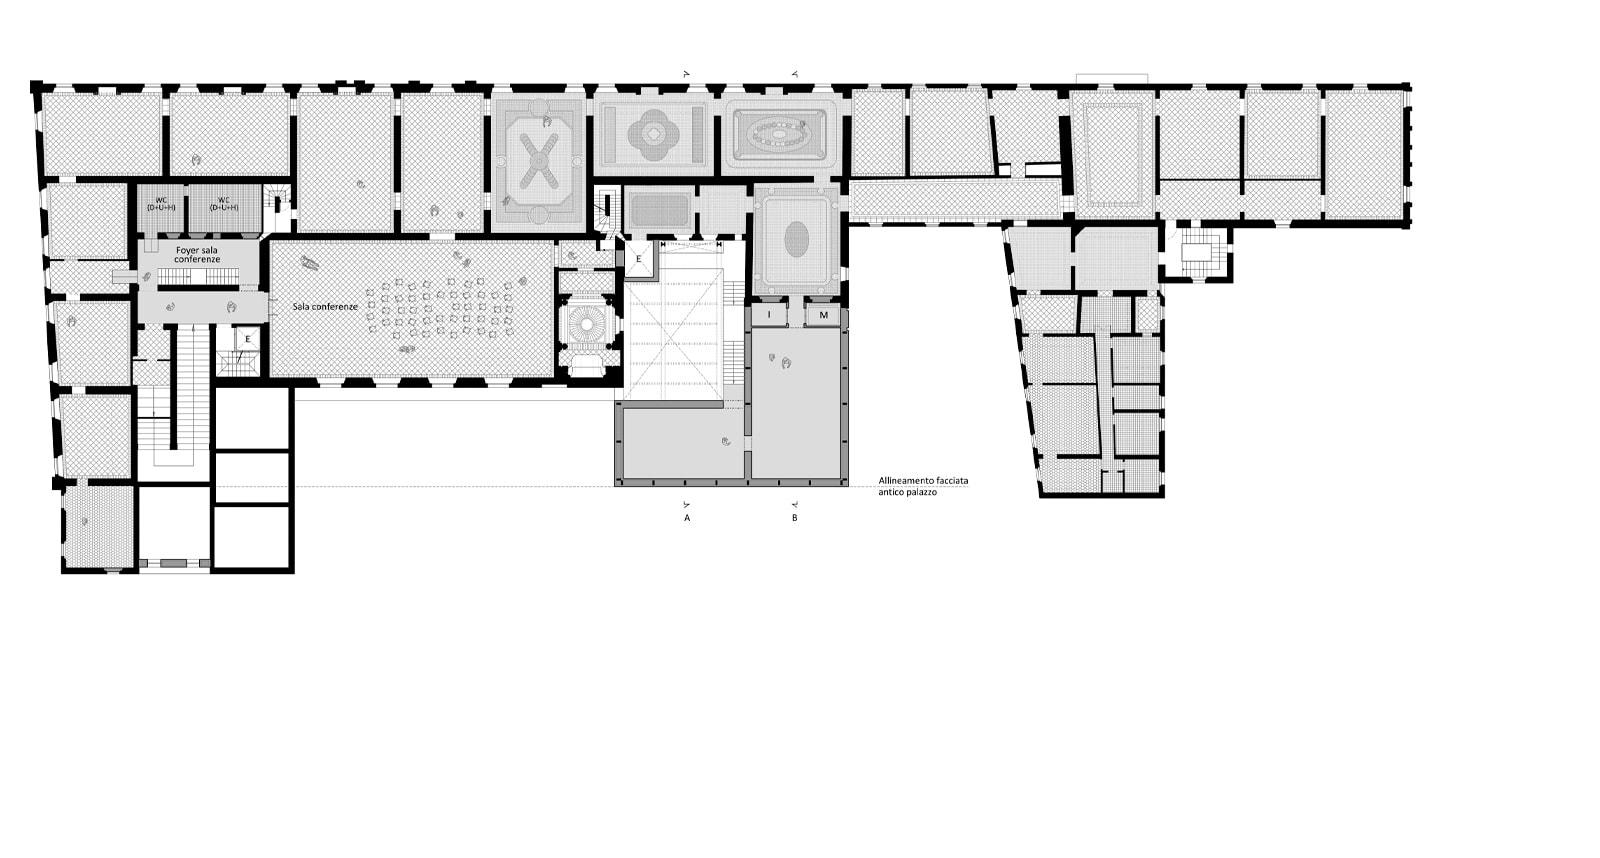 palazzo-massari-second-floor